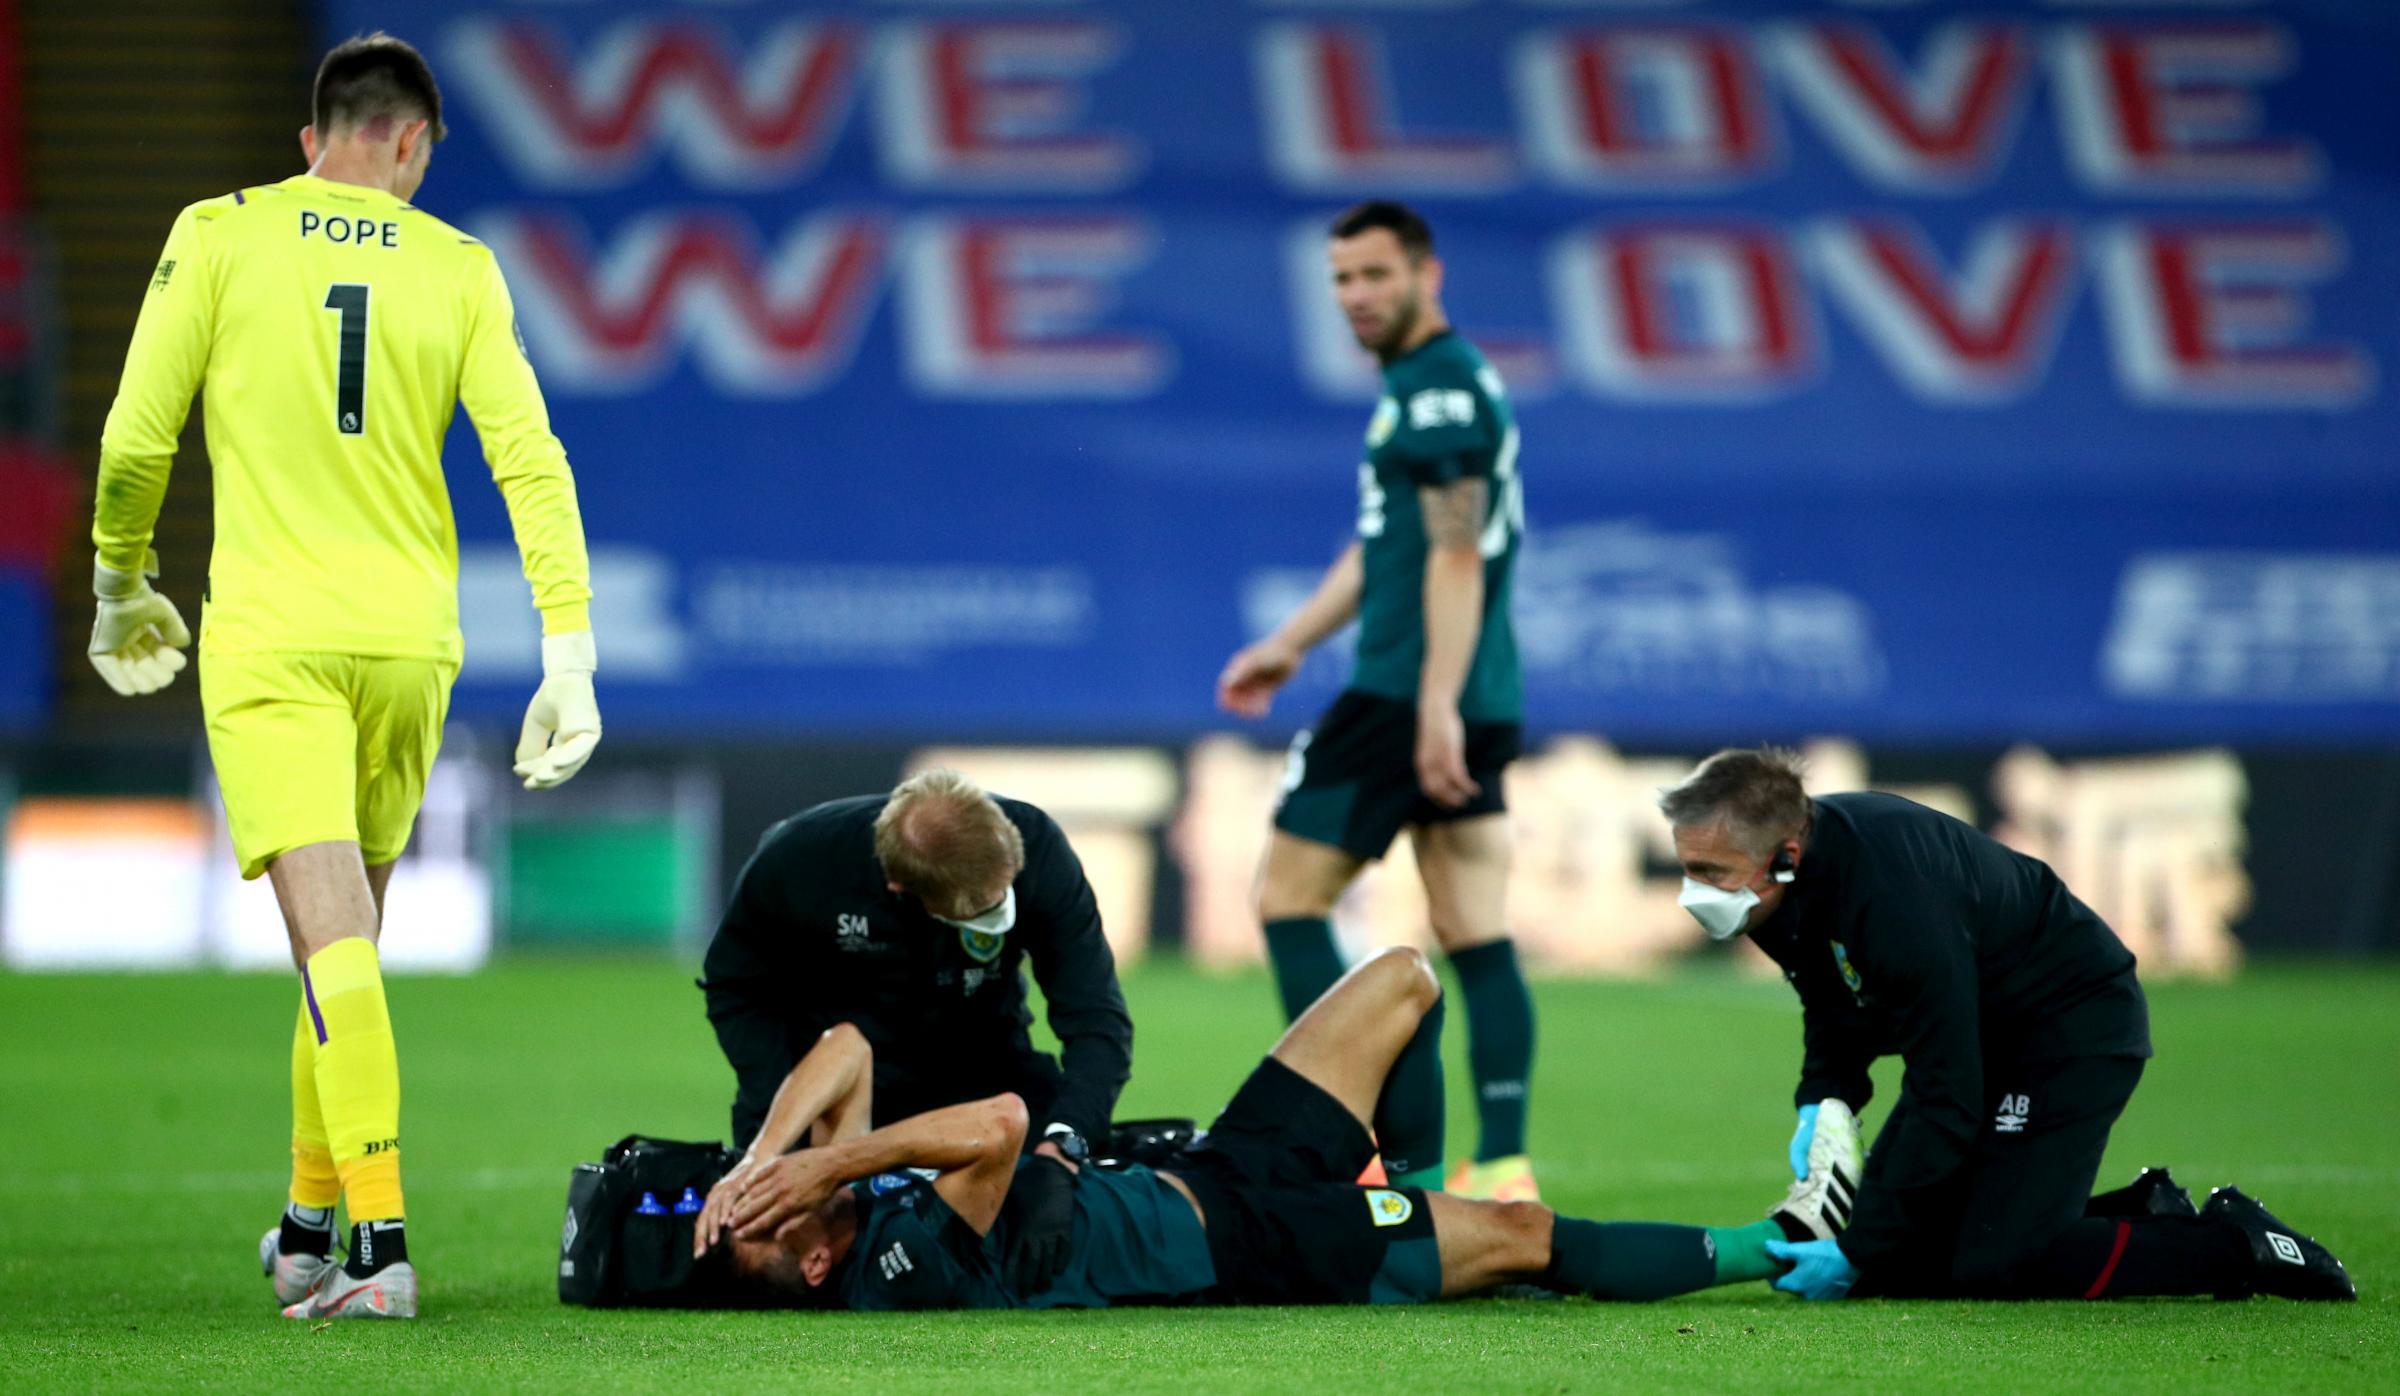 Sean Dyche backs threadbare Burnley squad in Europa League bid